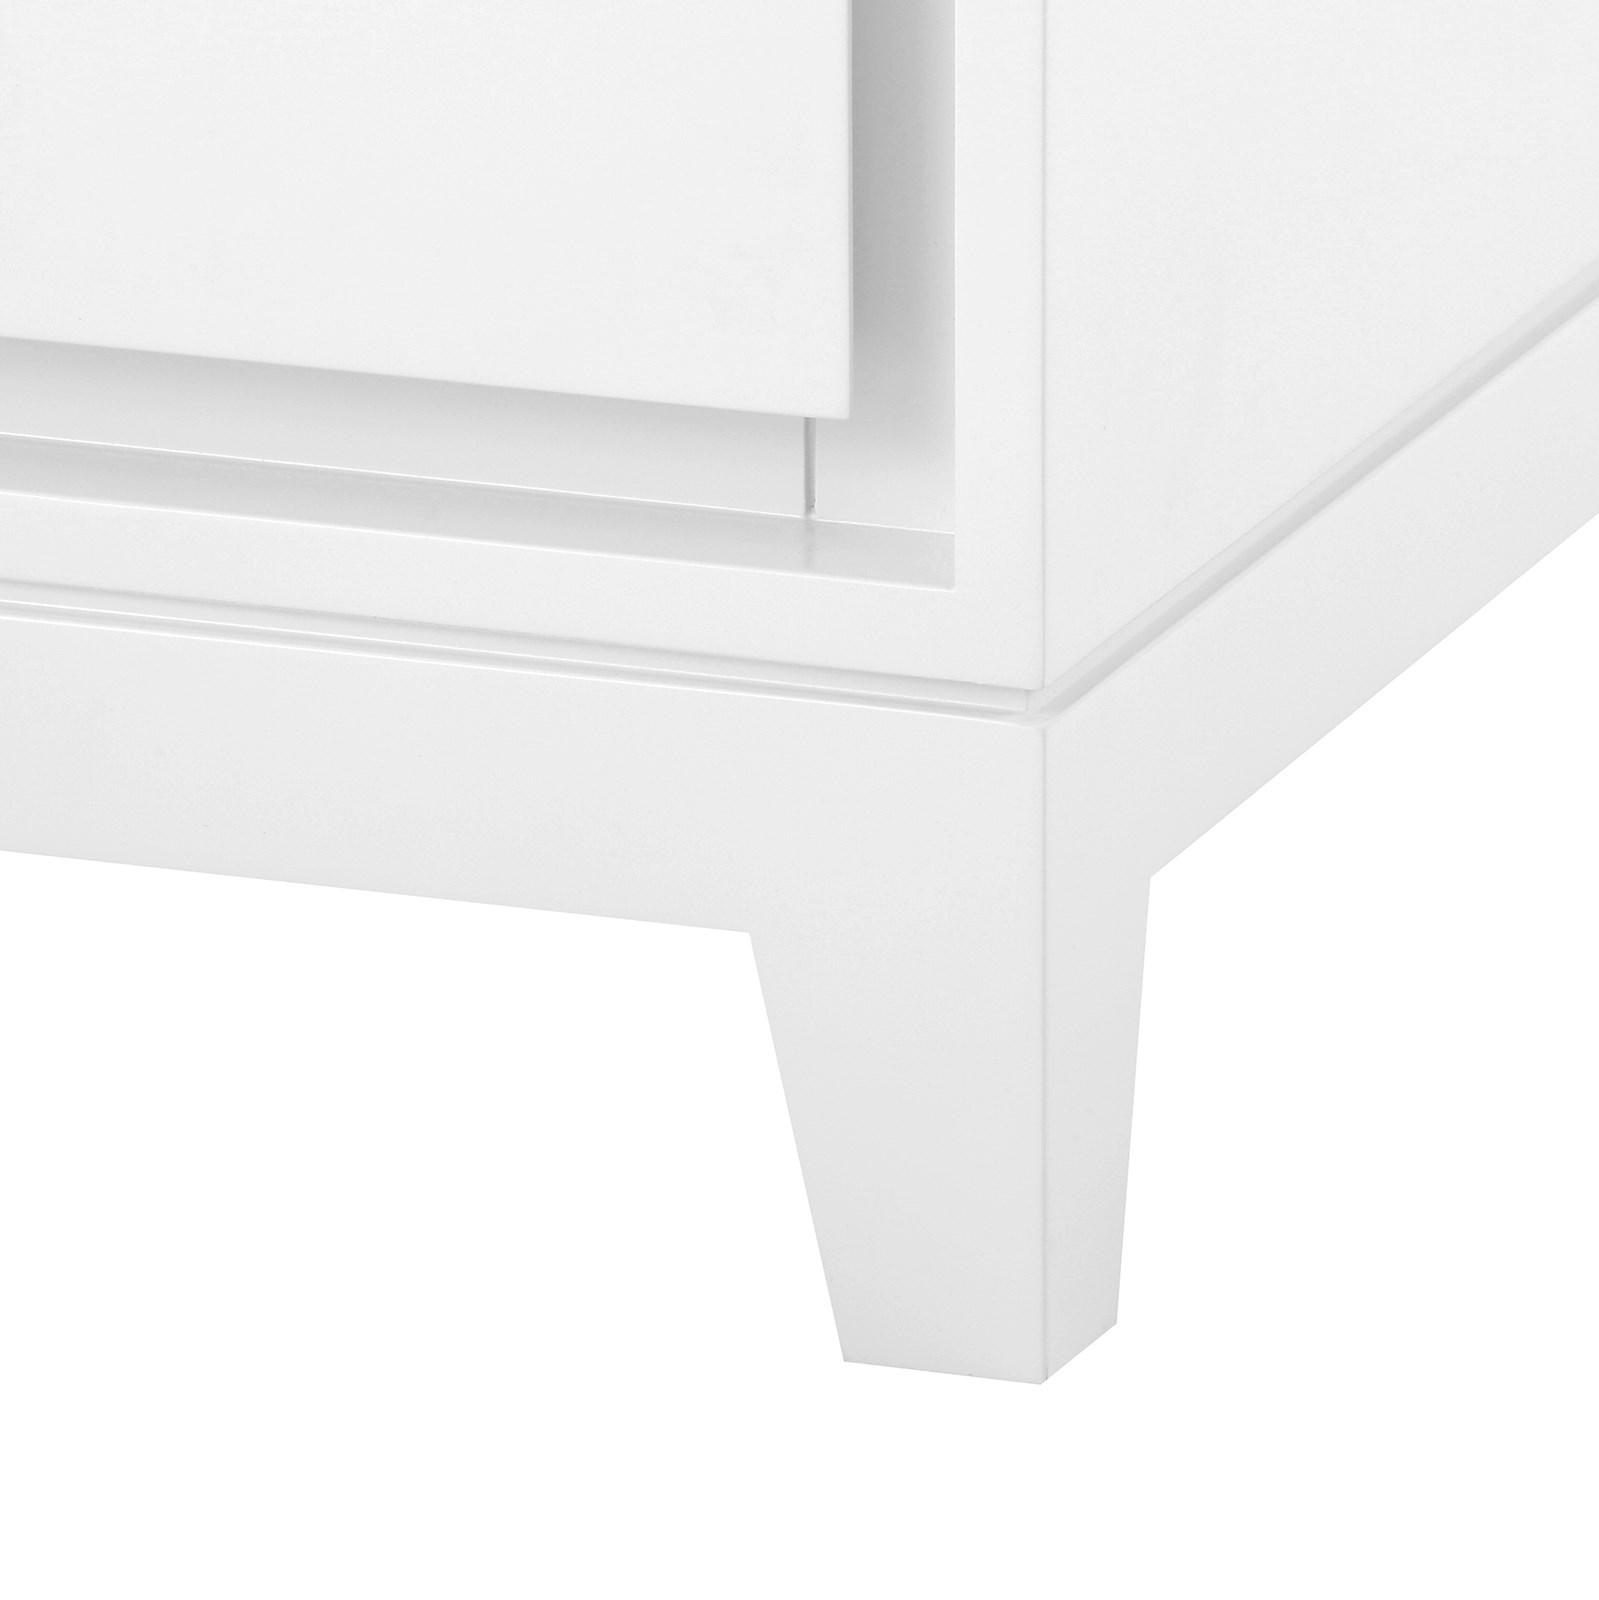 Bergamo 3 drawer side table white bungalow 5 bergamo 3 drawer side table white geotapseo Choice Image